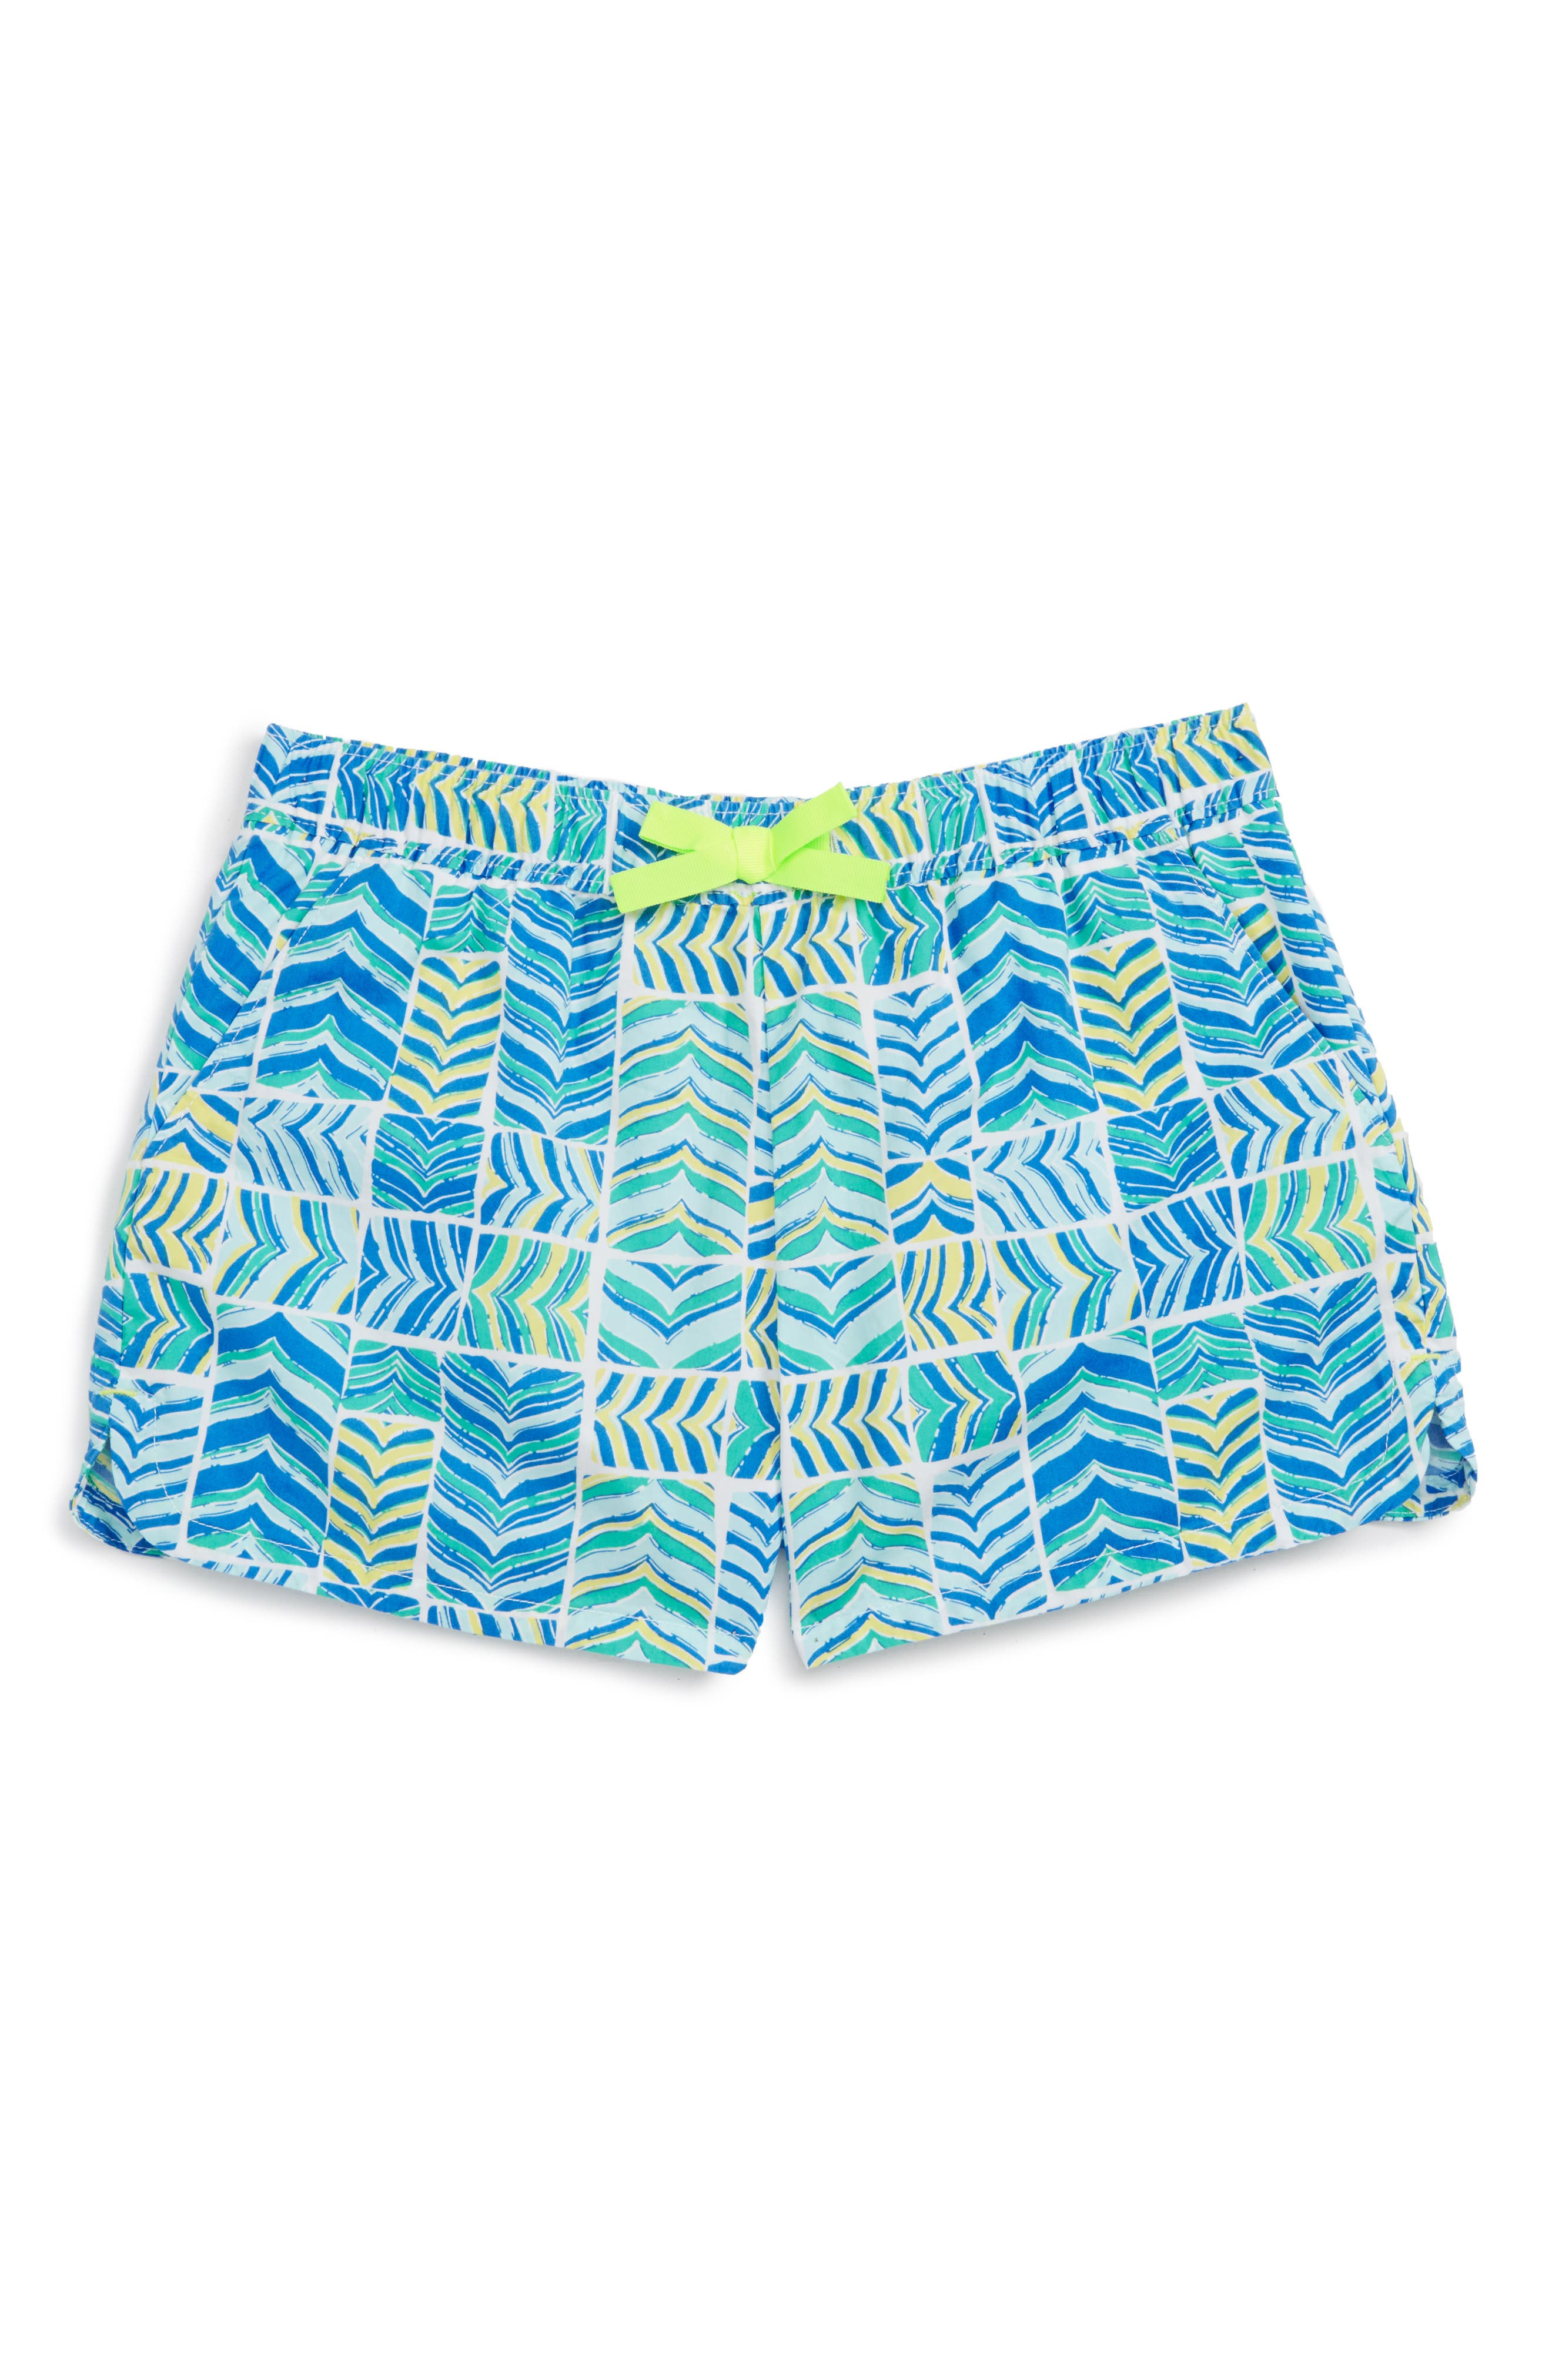 Whaletail Patchwork Shorts,                             Main thumbnail 1, color,                             Azure Blue